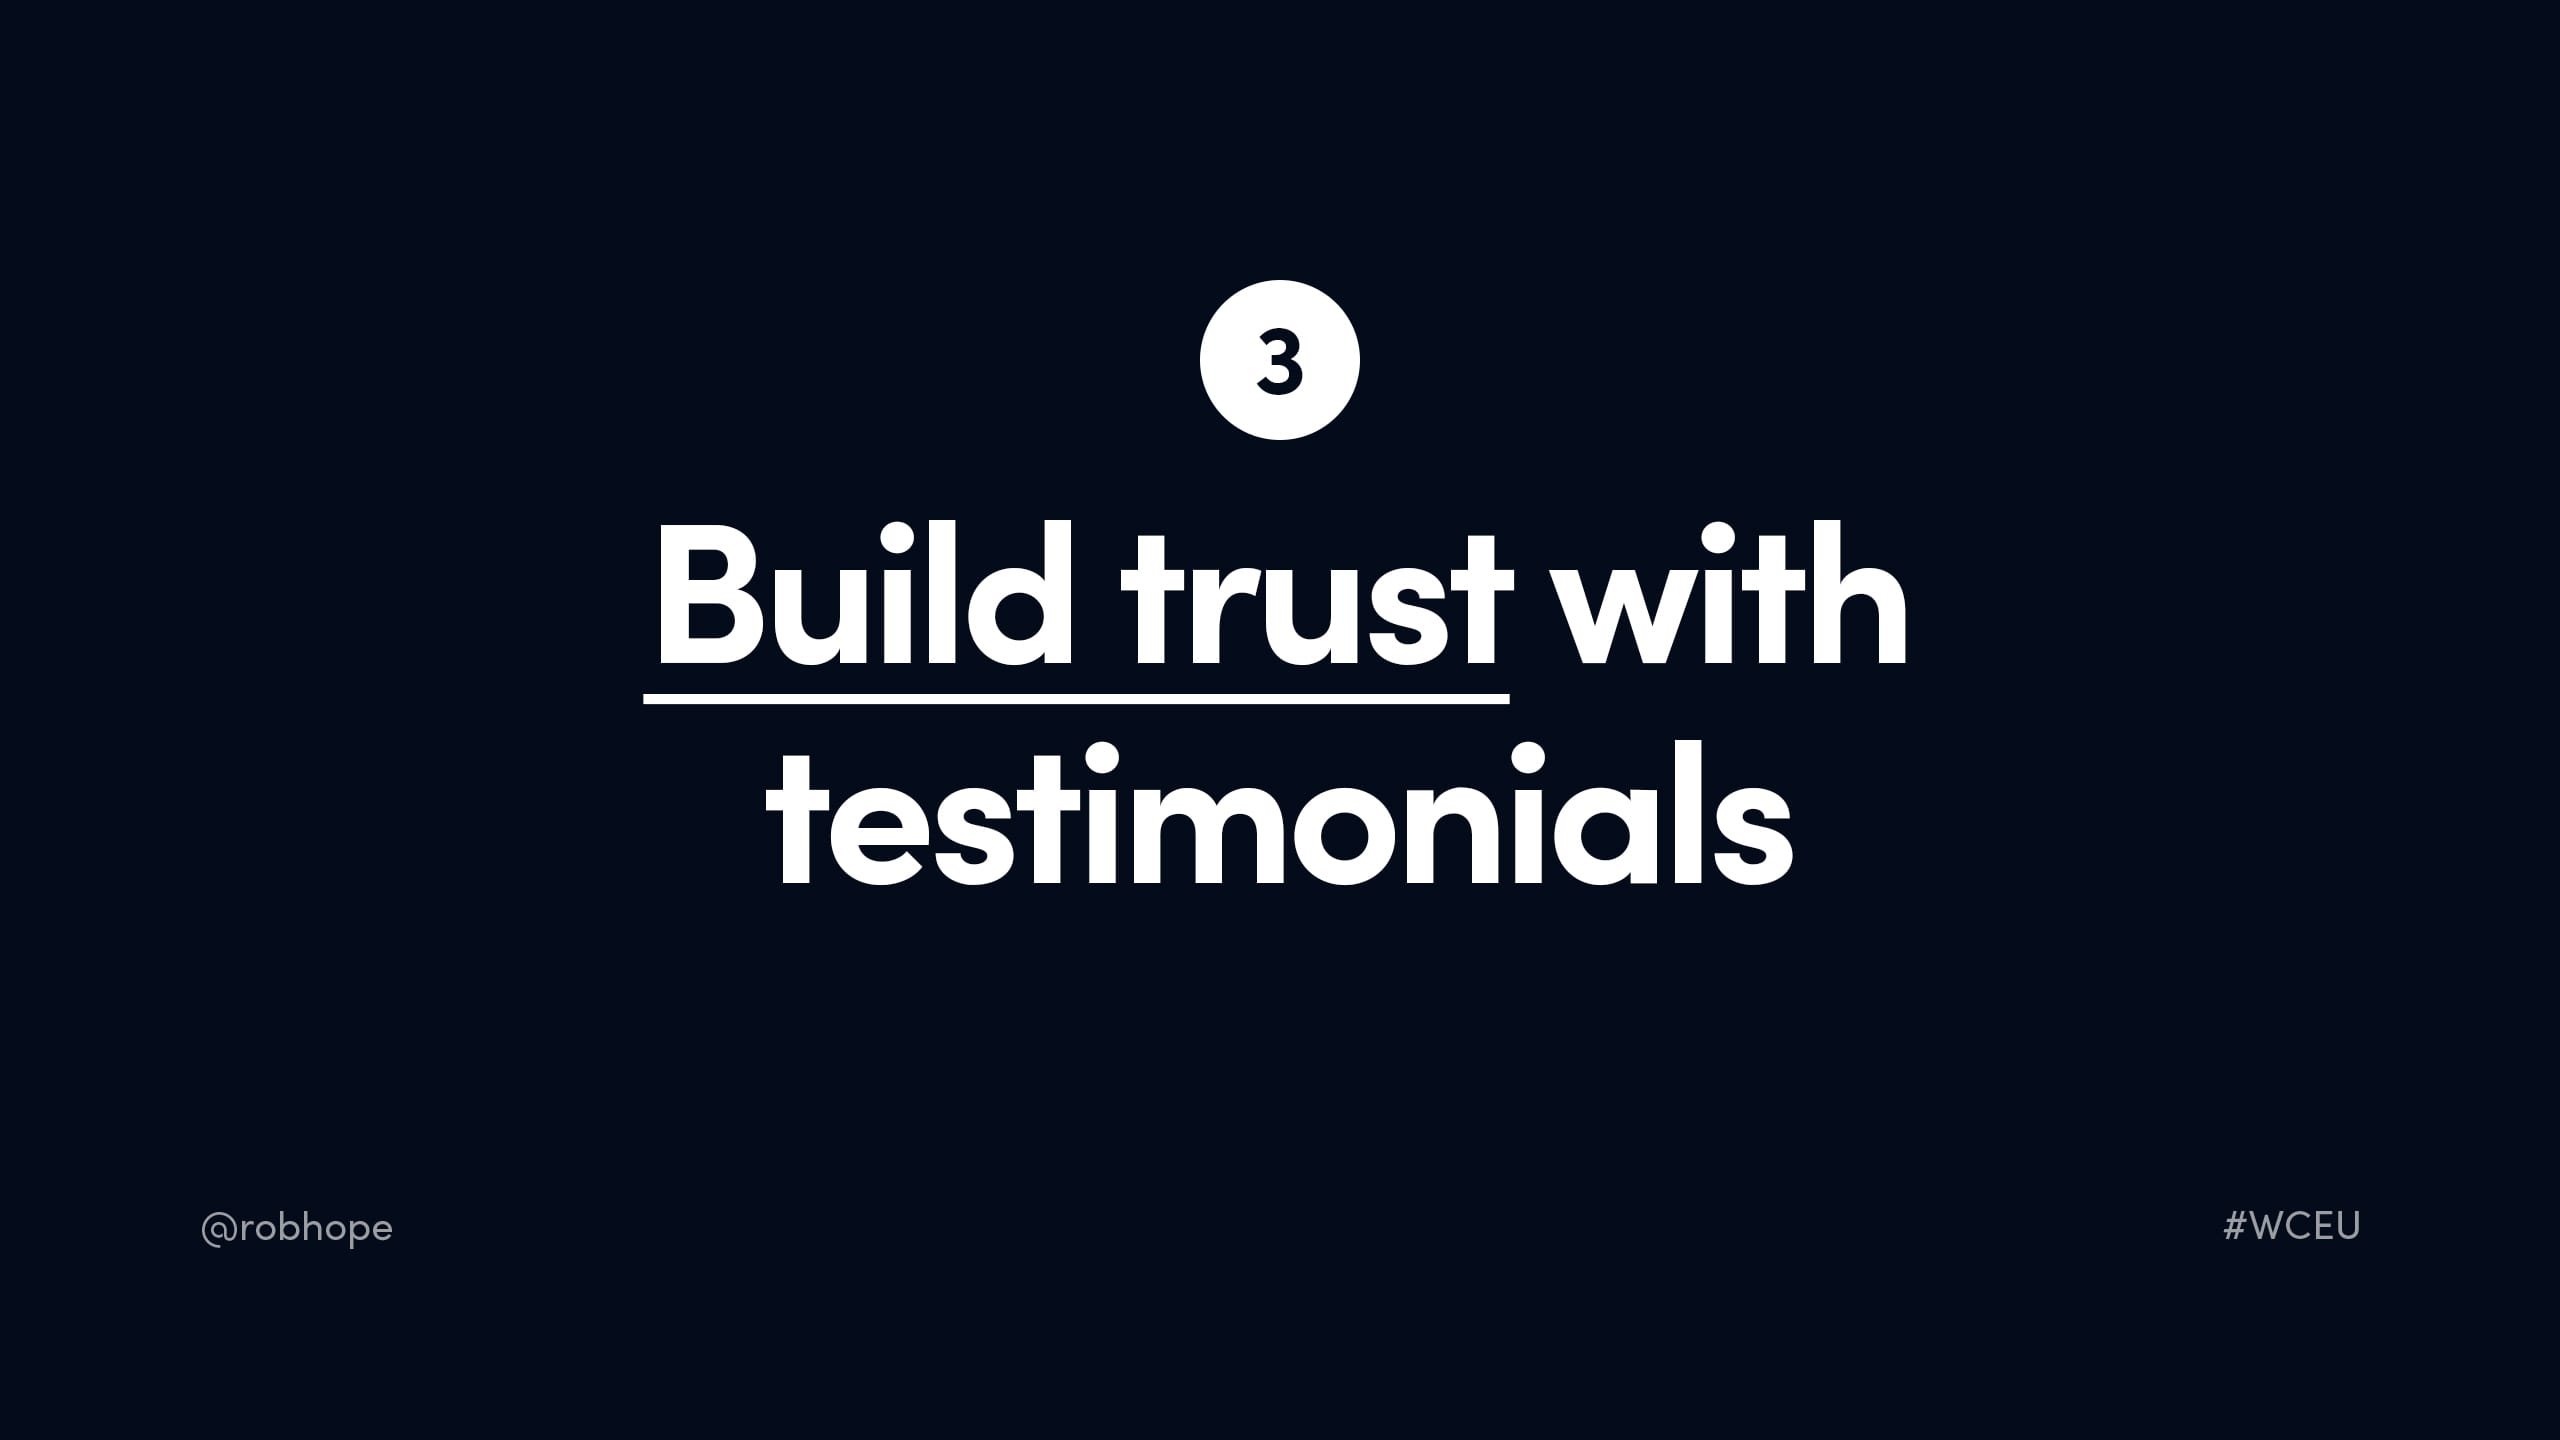 Build trust with Testimonials